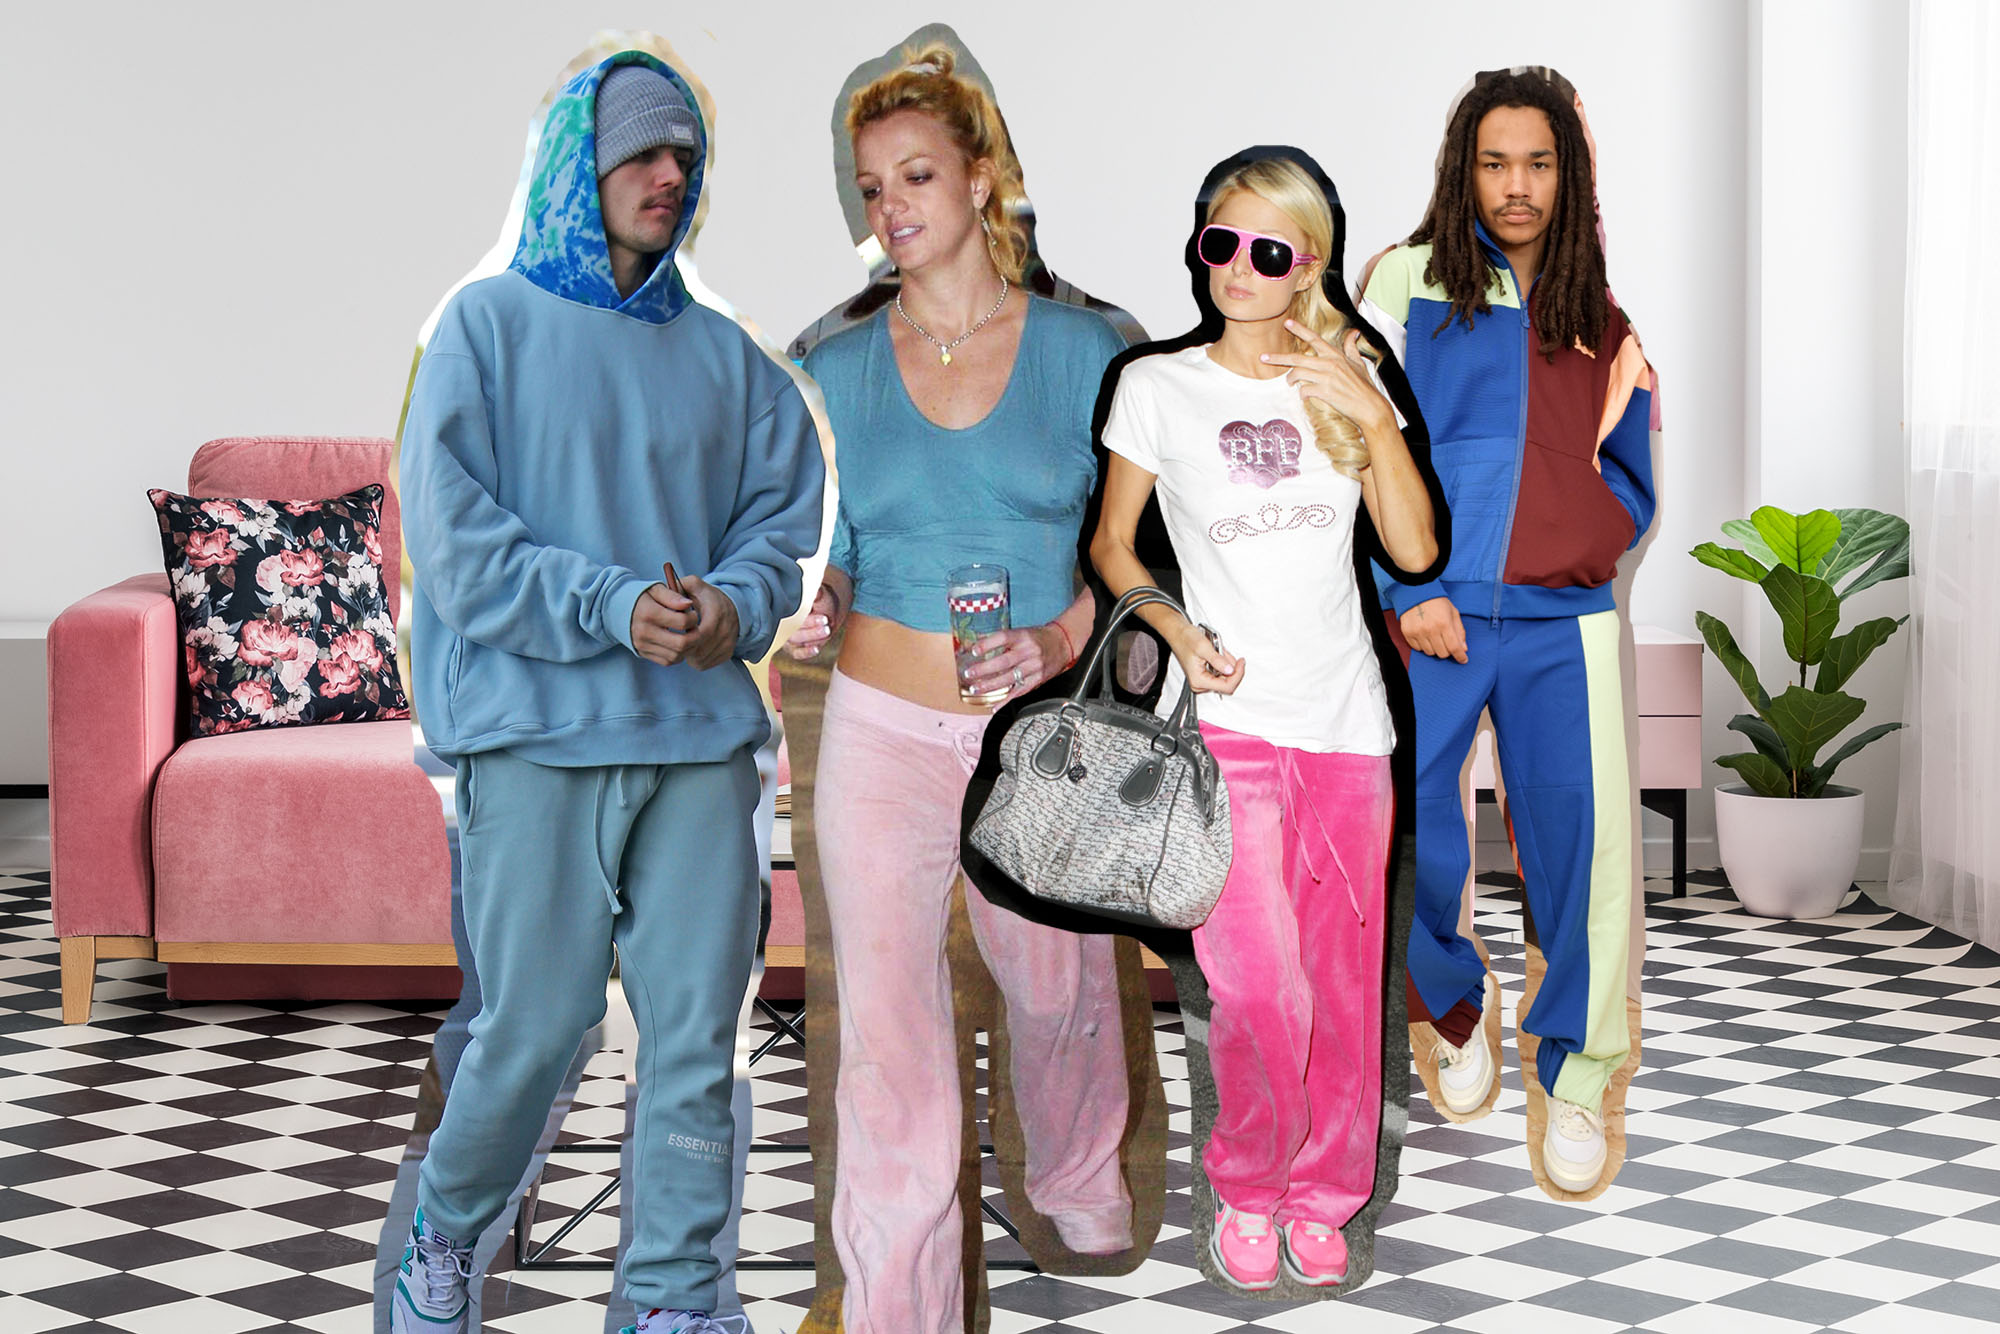 Celebrities wearing sweatpants